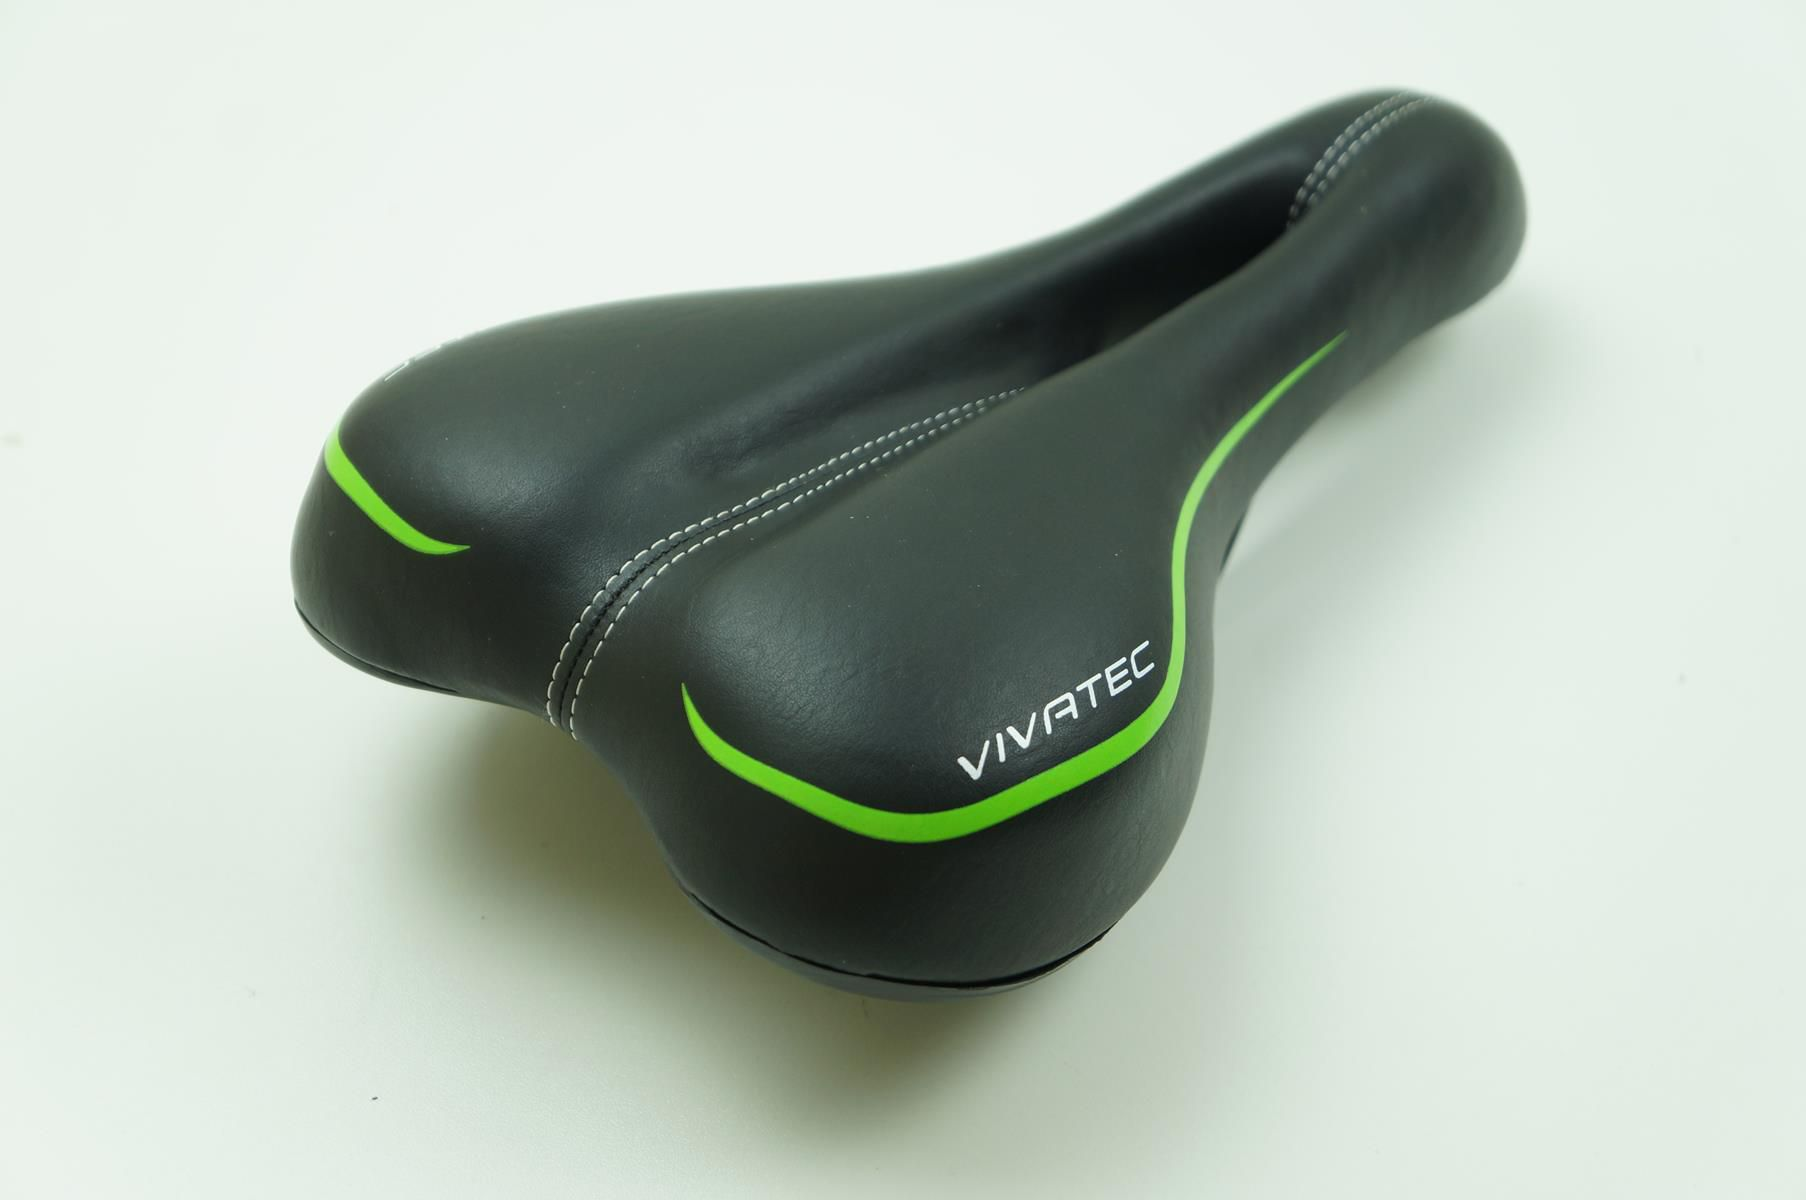 Selim Banco Bicicleta MTB Vicinitech Vivatec Super Confortável 155mm Largura